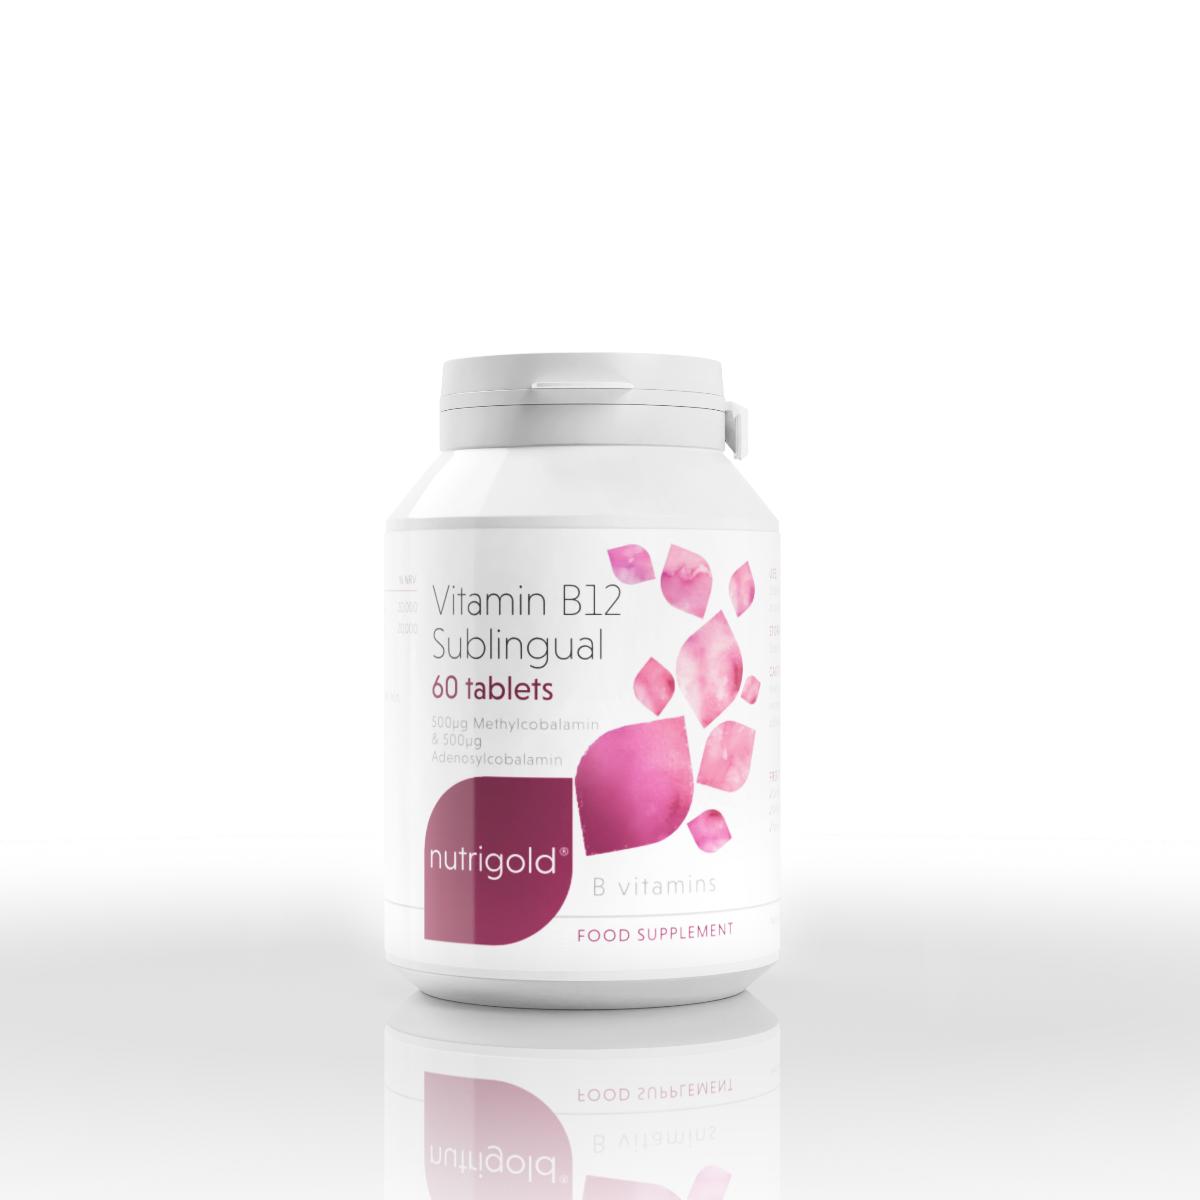 Vitamin B12 Sublingual 60's